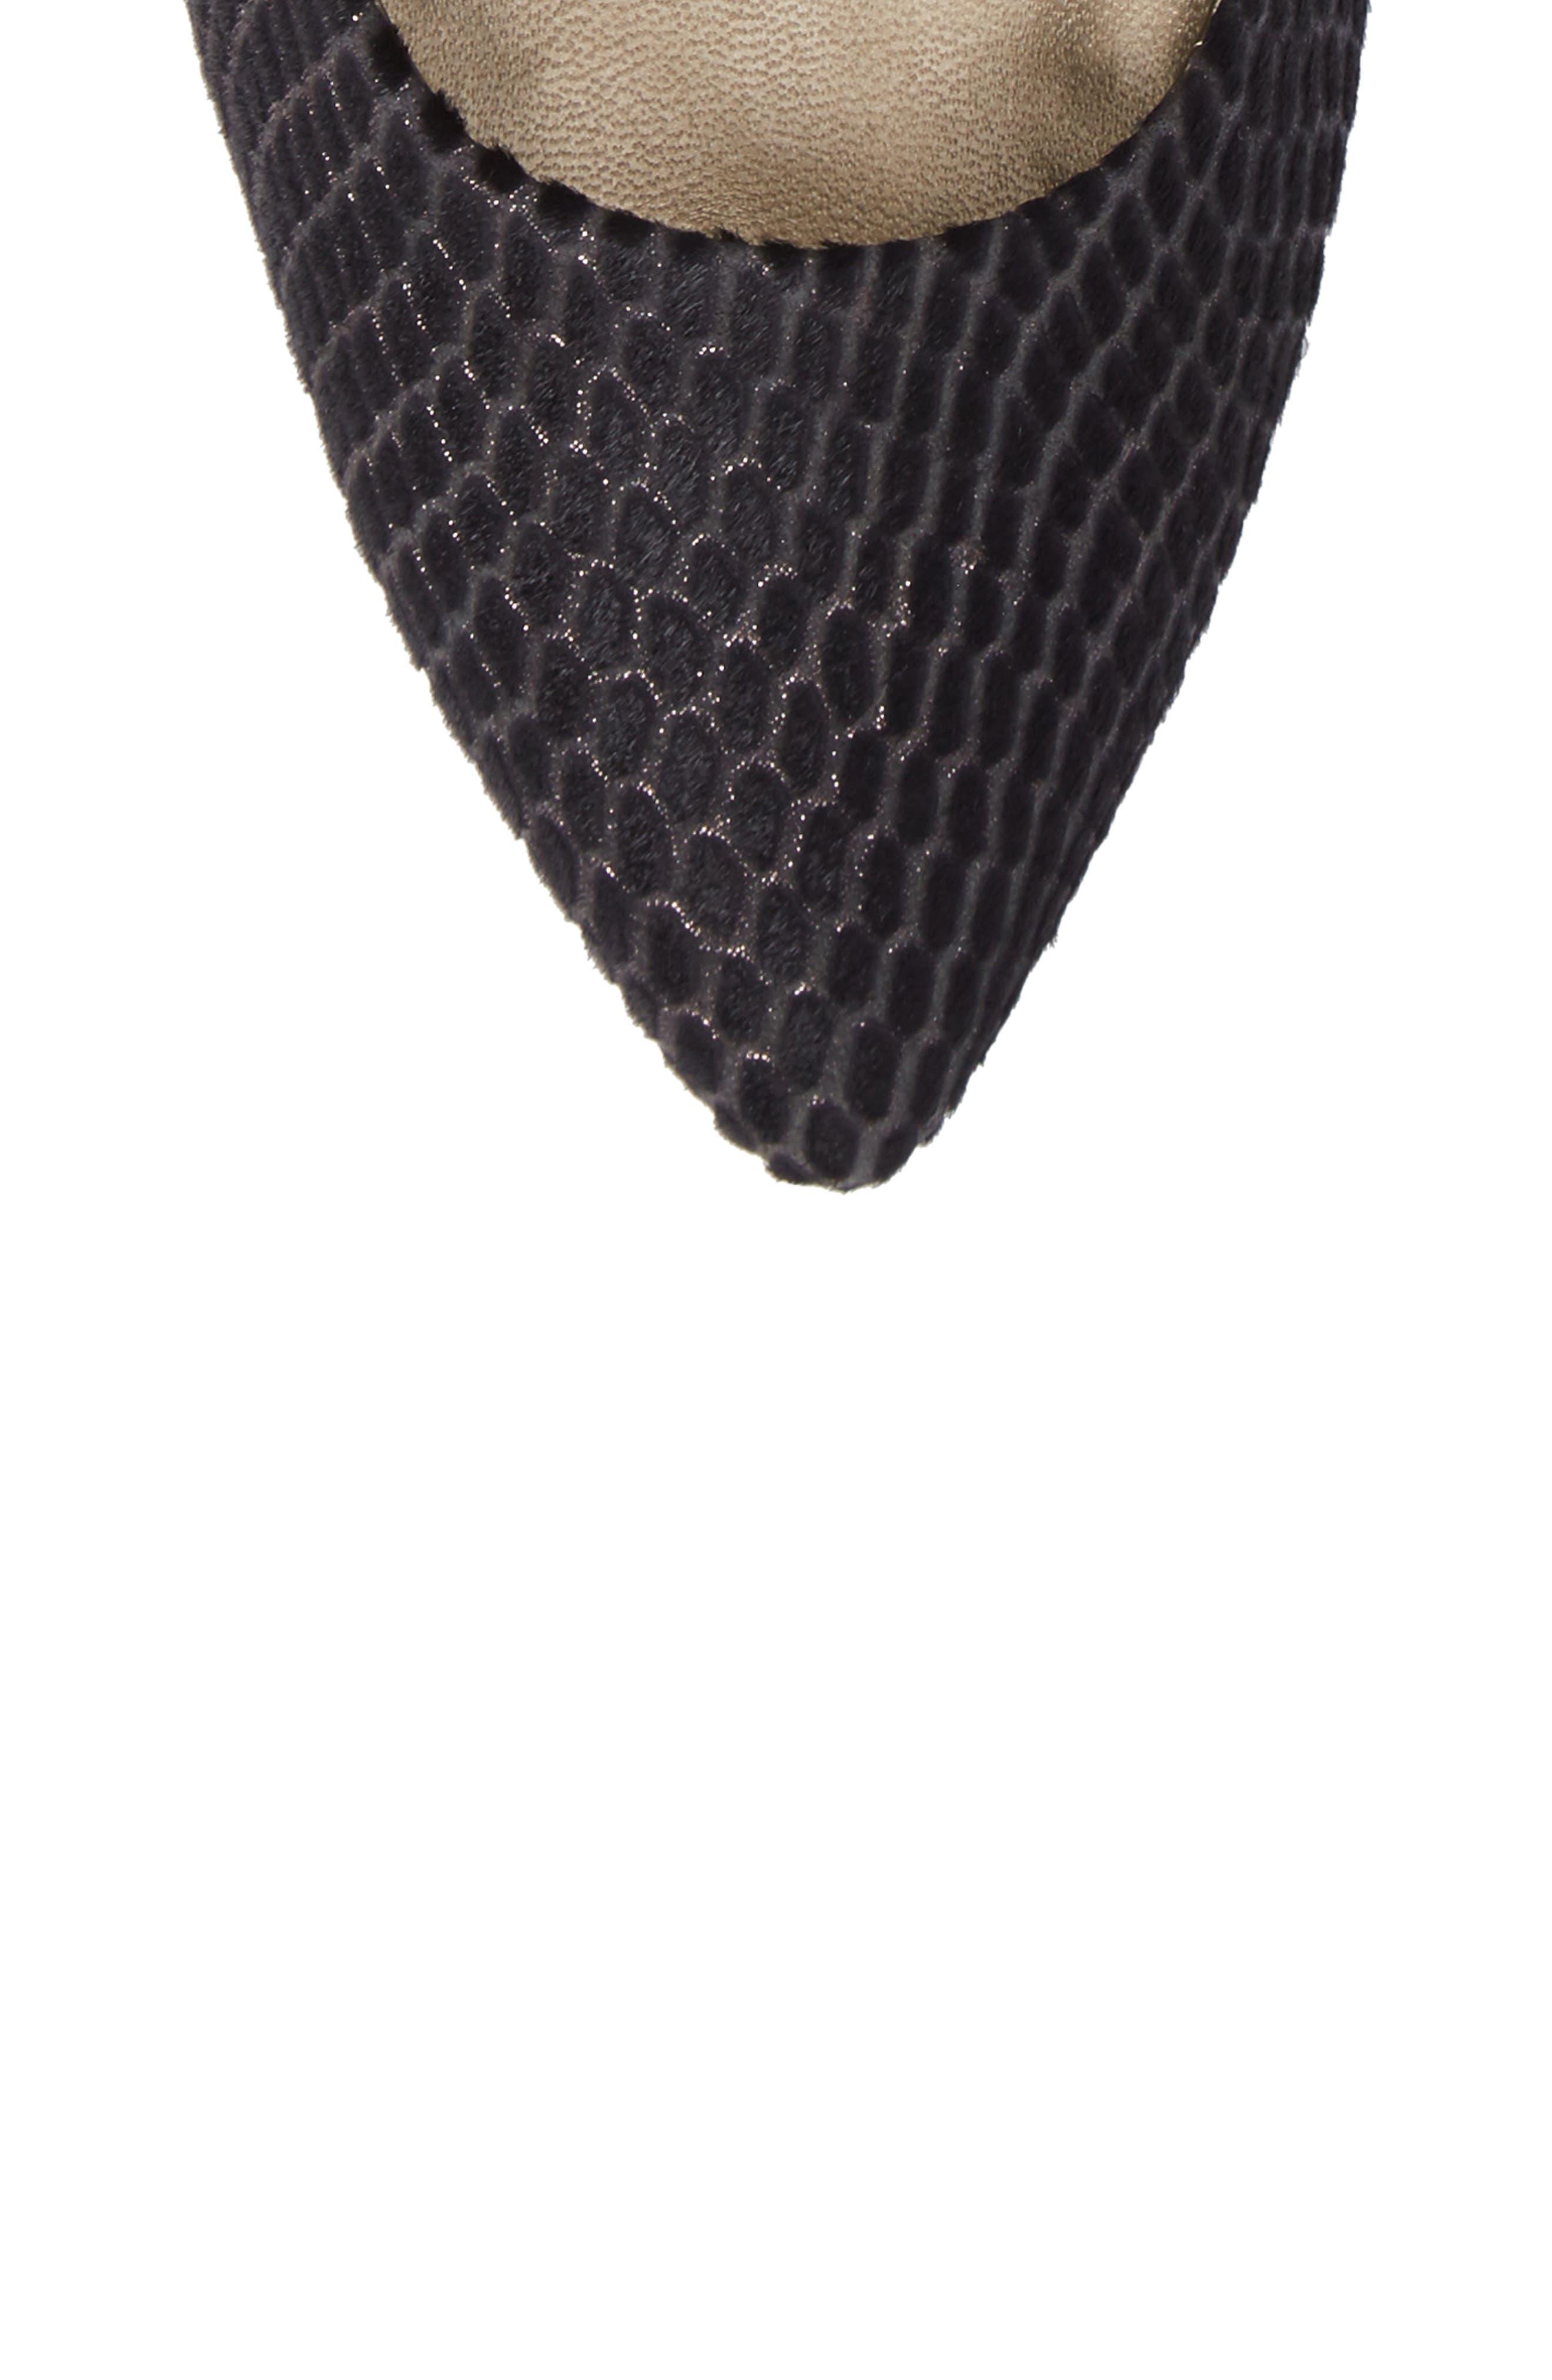 Symphony Pointy Toe Pump,                             Alternate thumbnail 6, color,                             Black Leather